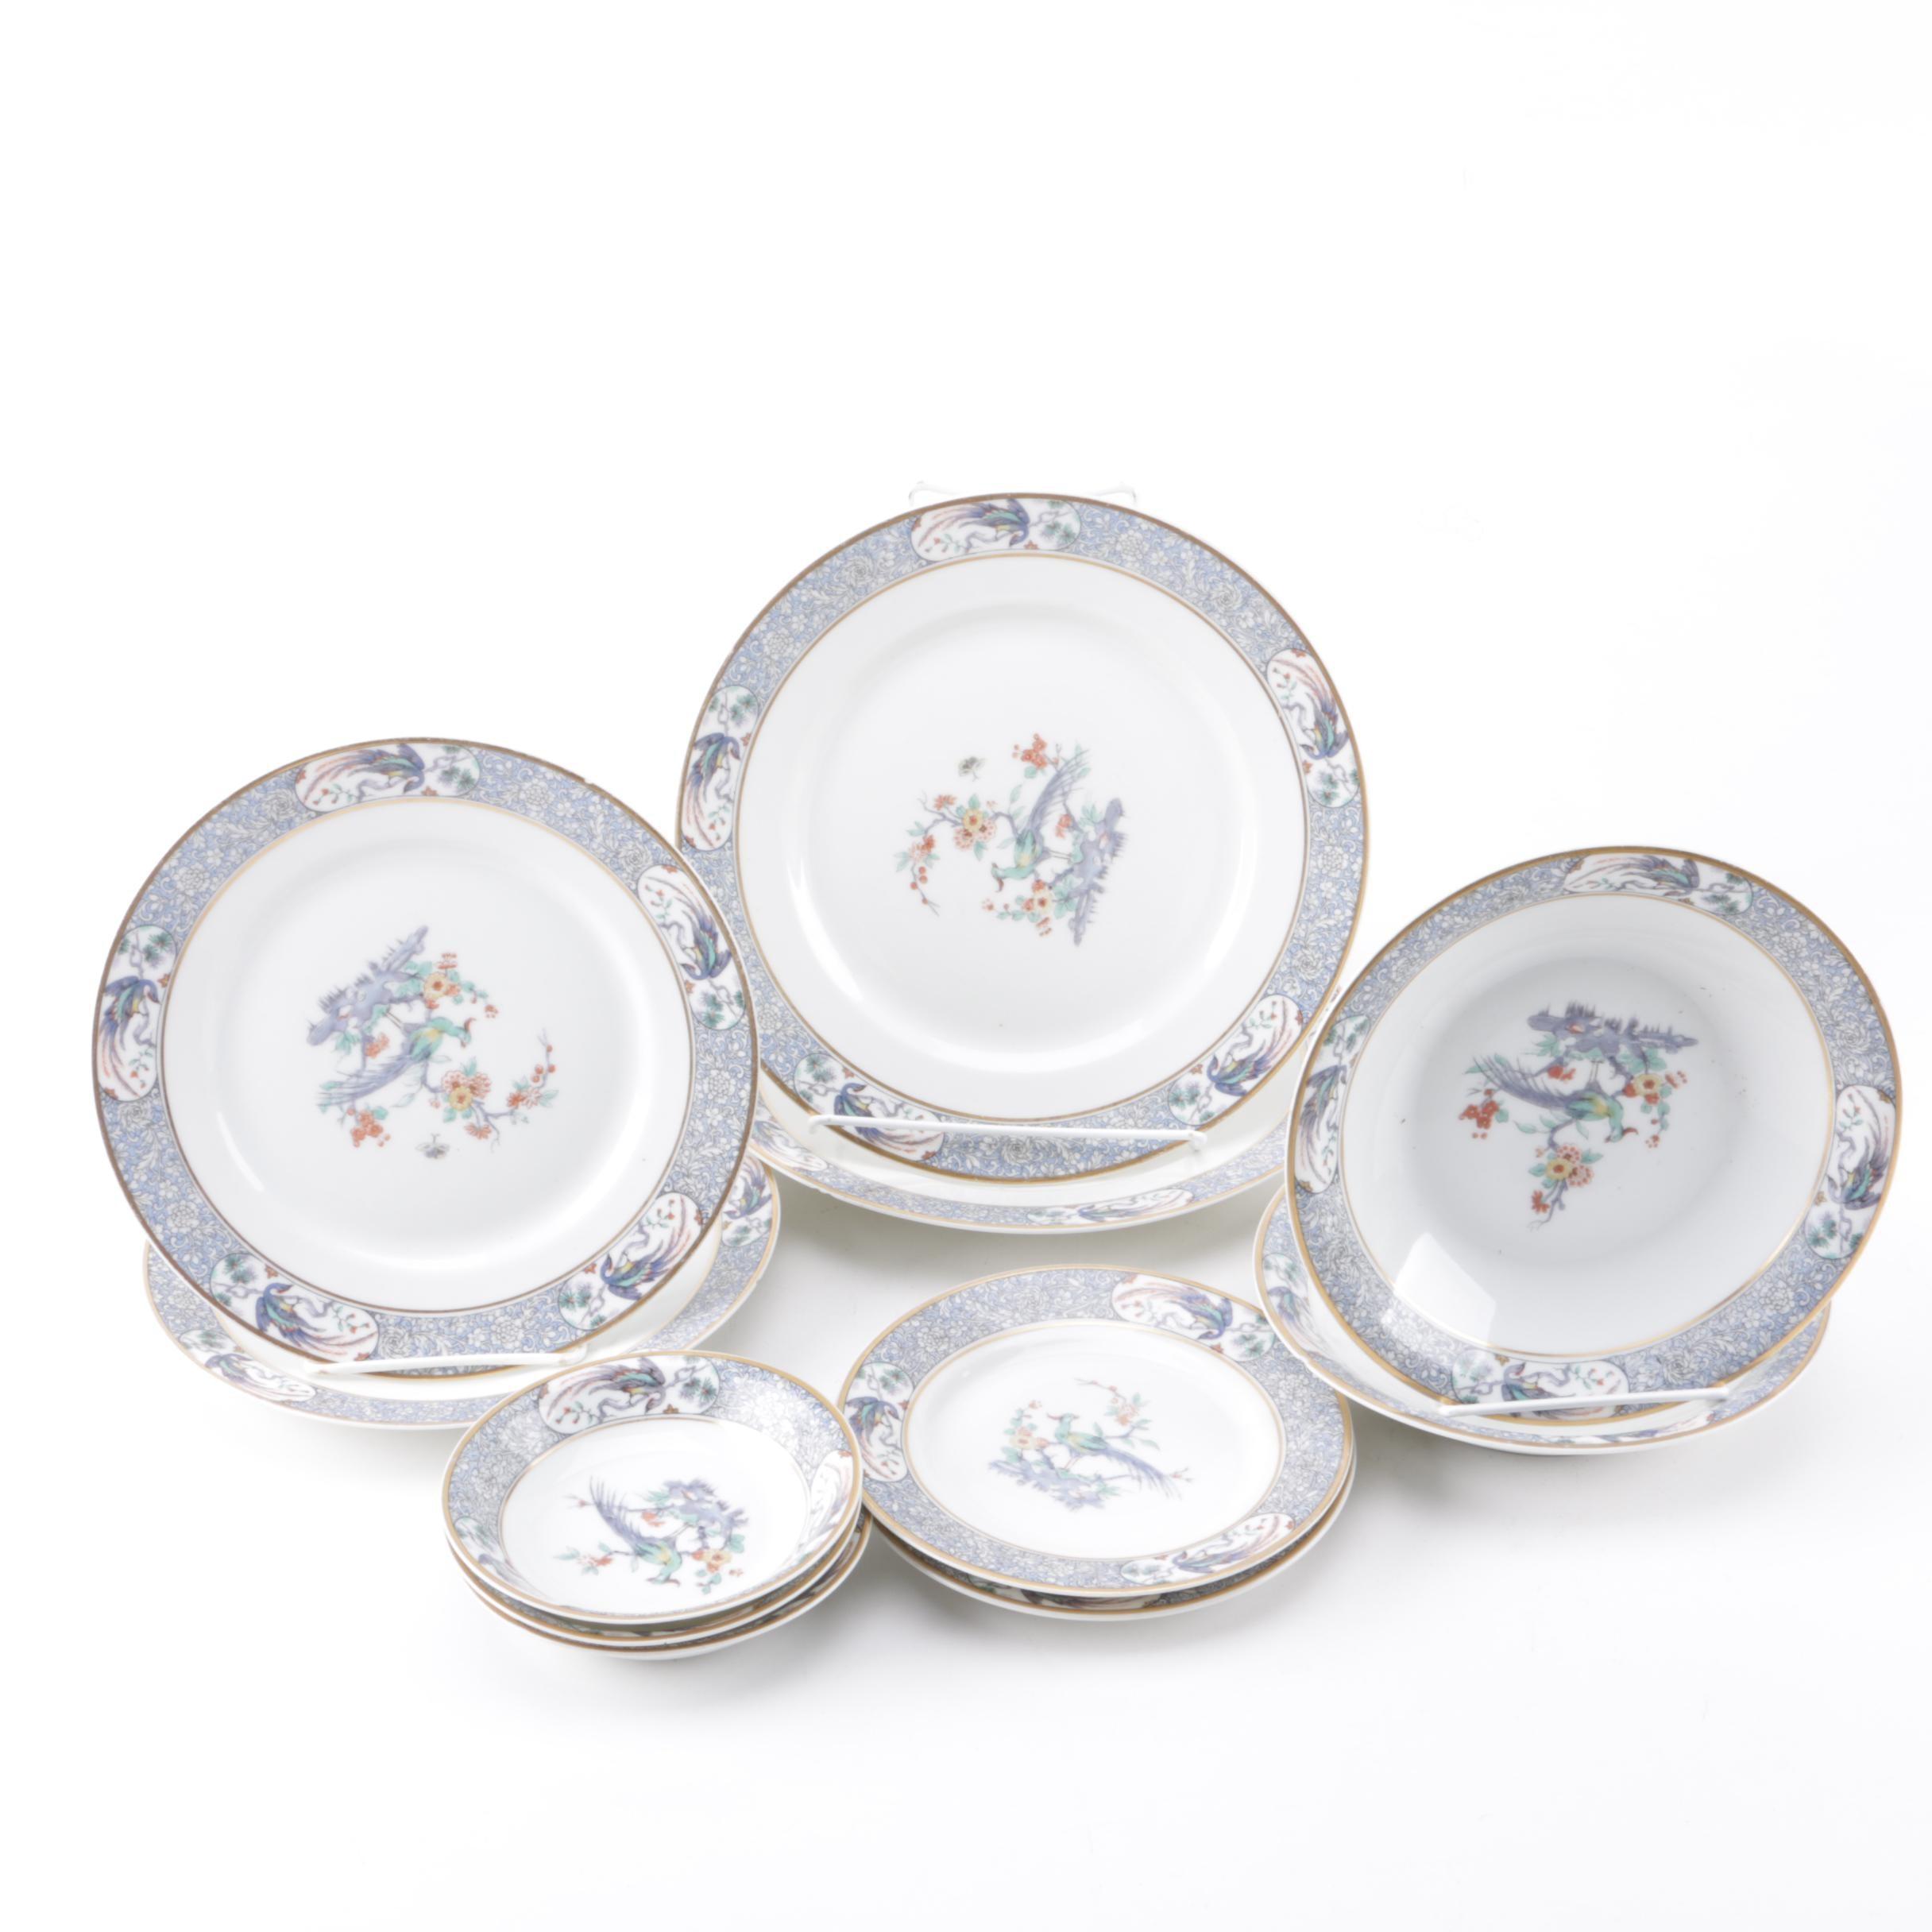 "Early 20th Century Theodore Haviland Limoges ""Rajah"" Porcelain Tableware"